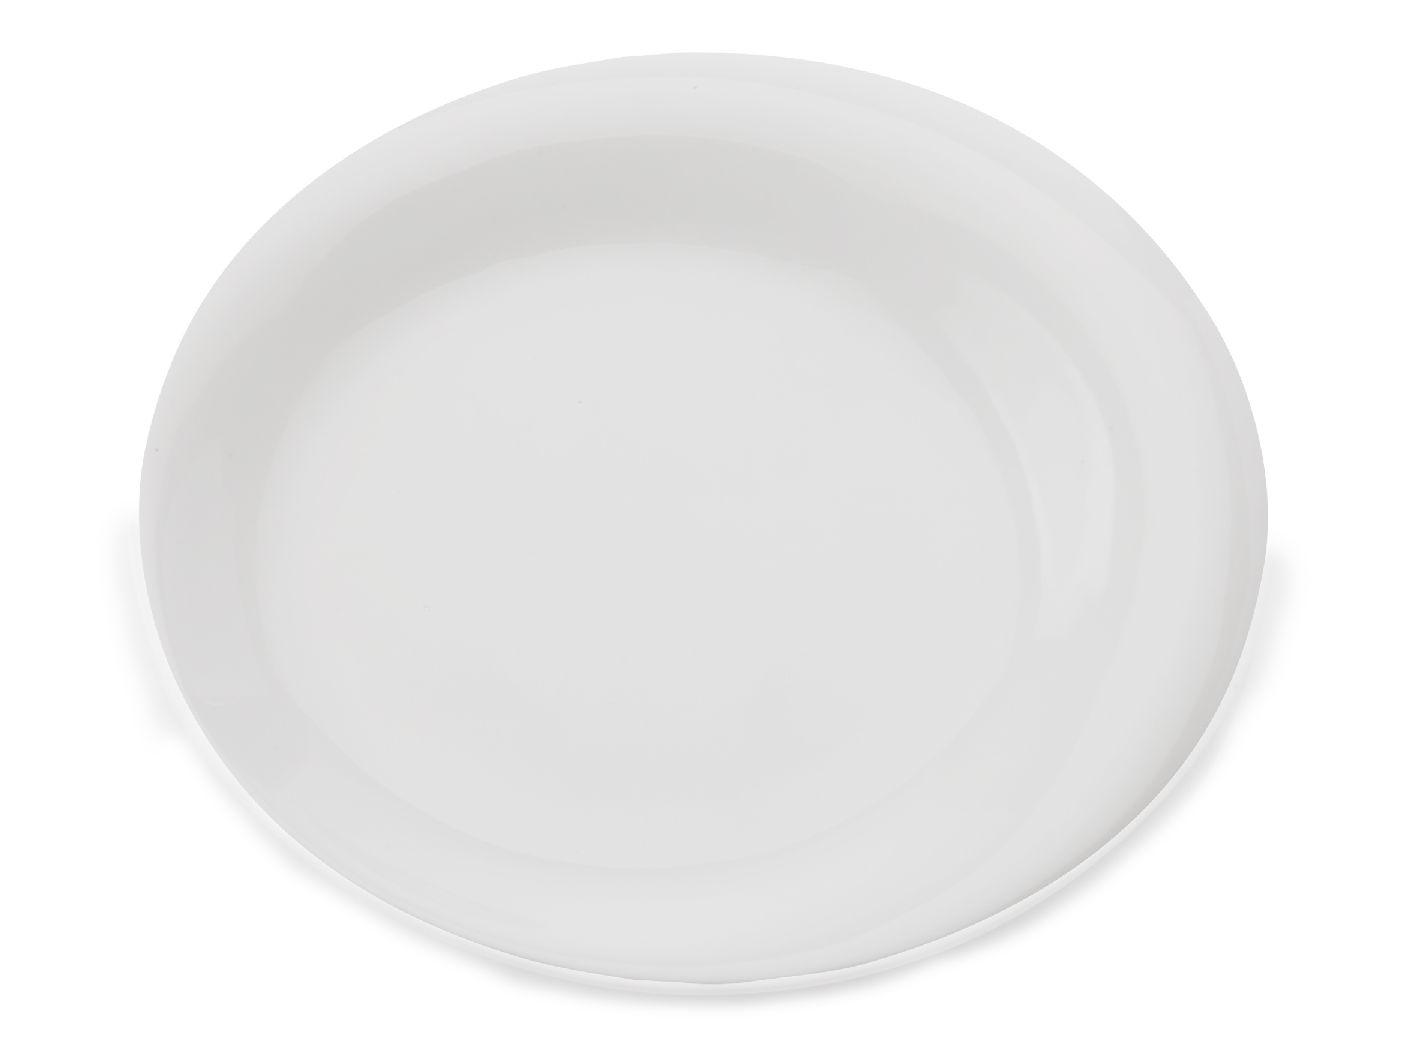 Mělký talíř White Bistro Lotic 25,5 cm - Maxwell&Williams